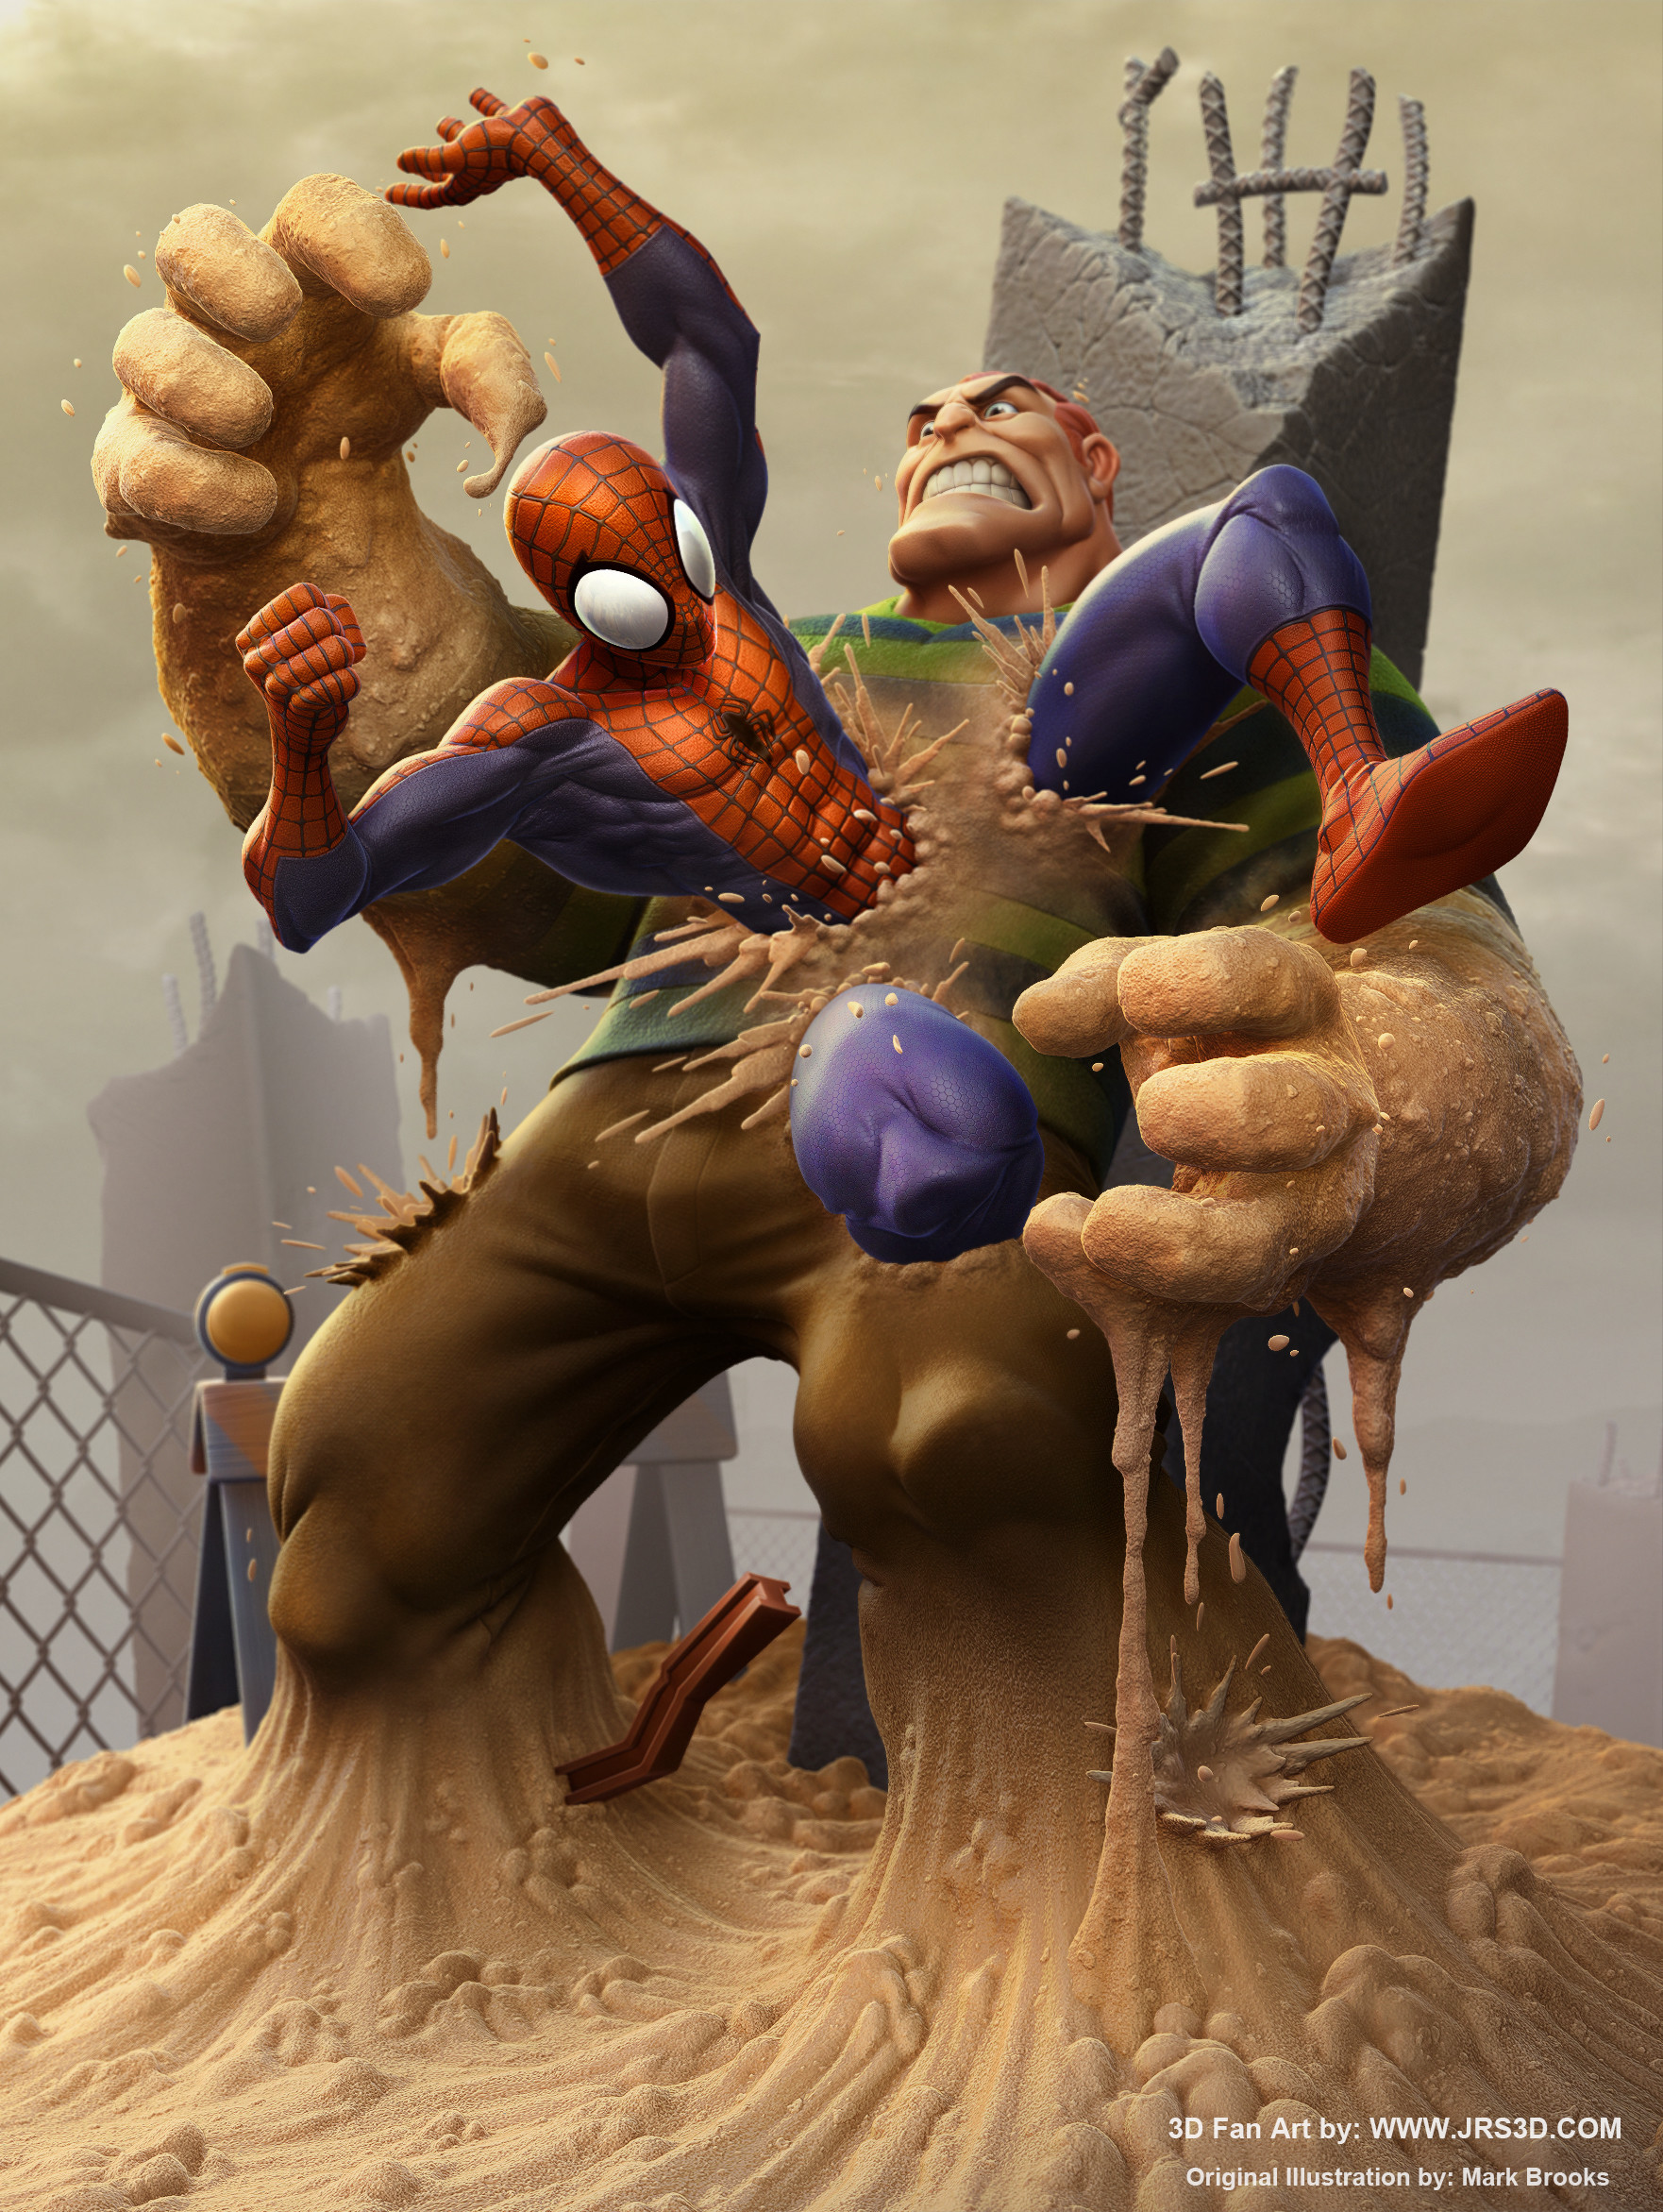 Spiderman Vs Sandman_FanArt